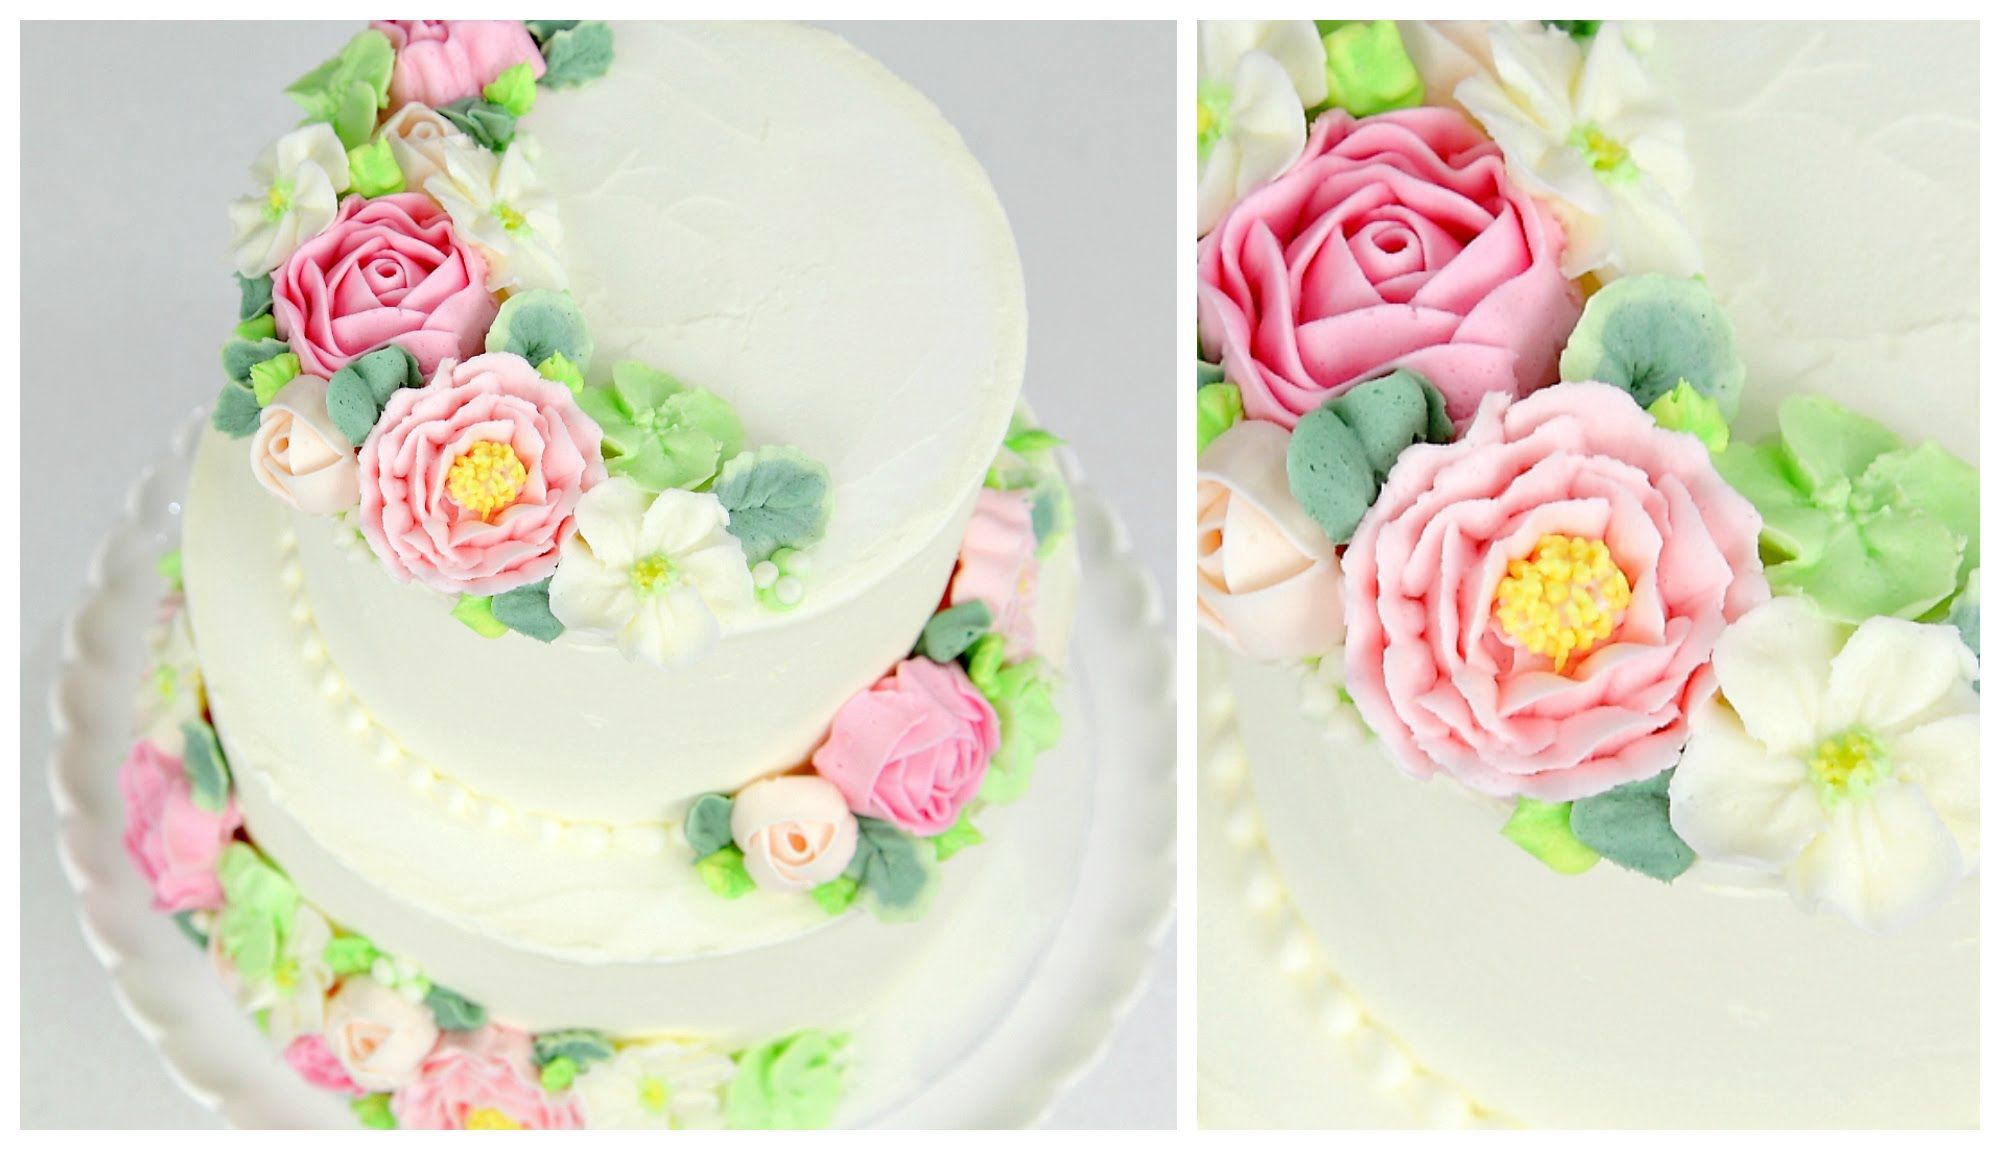 SUBSCRIBE HERE Bitly Cakestyle BUTTERCREAM CAKES Diy WeddingPerfect